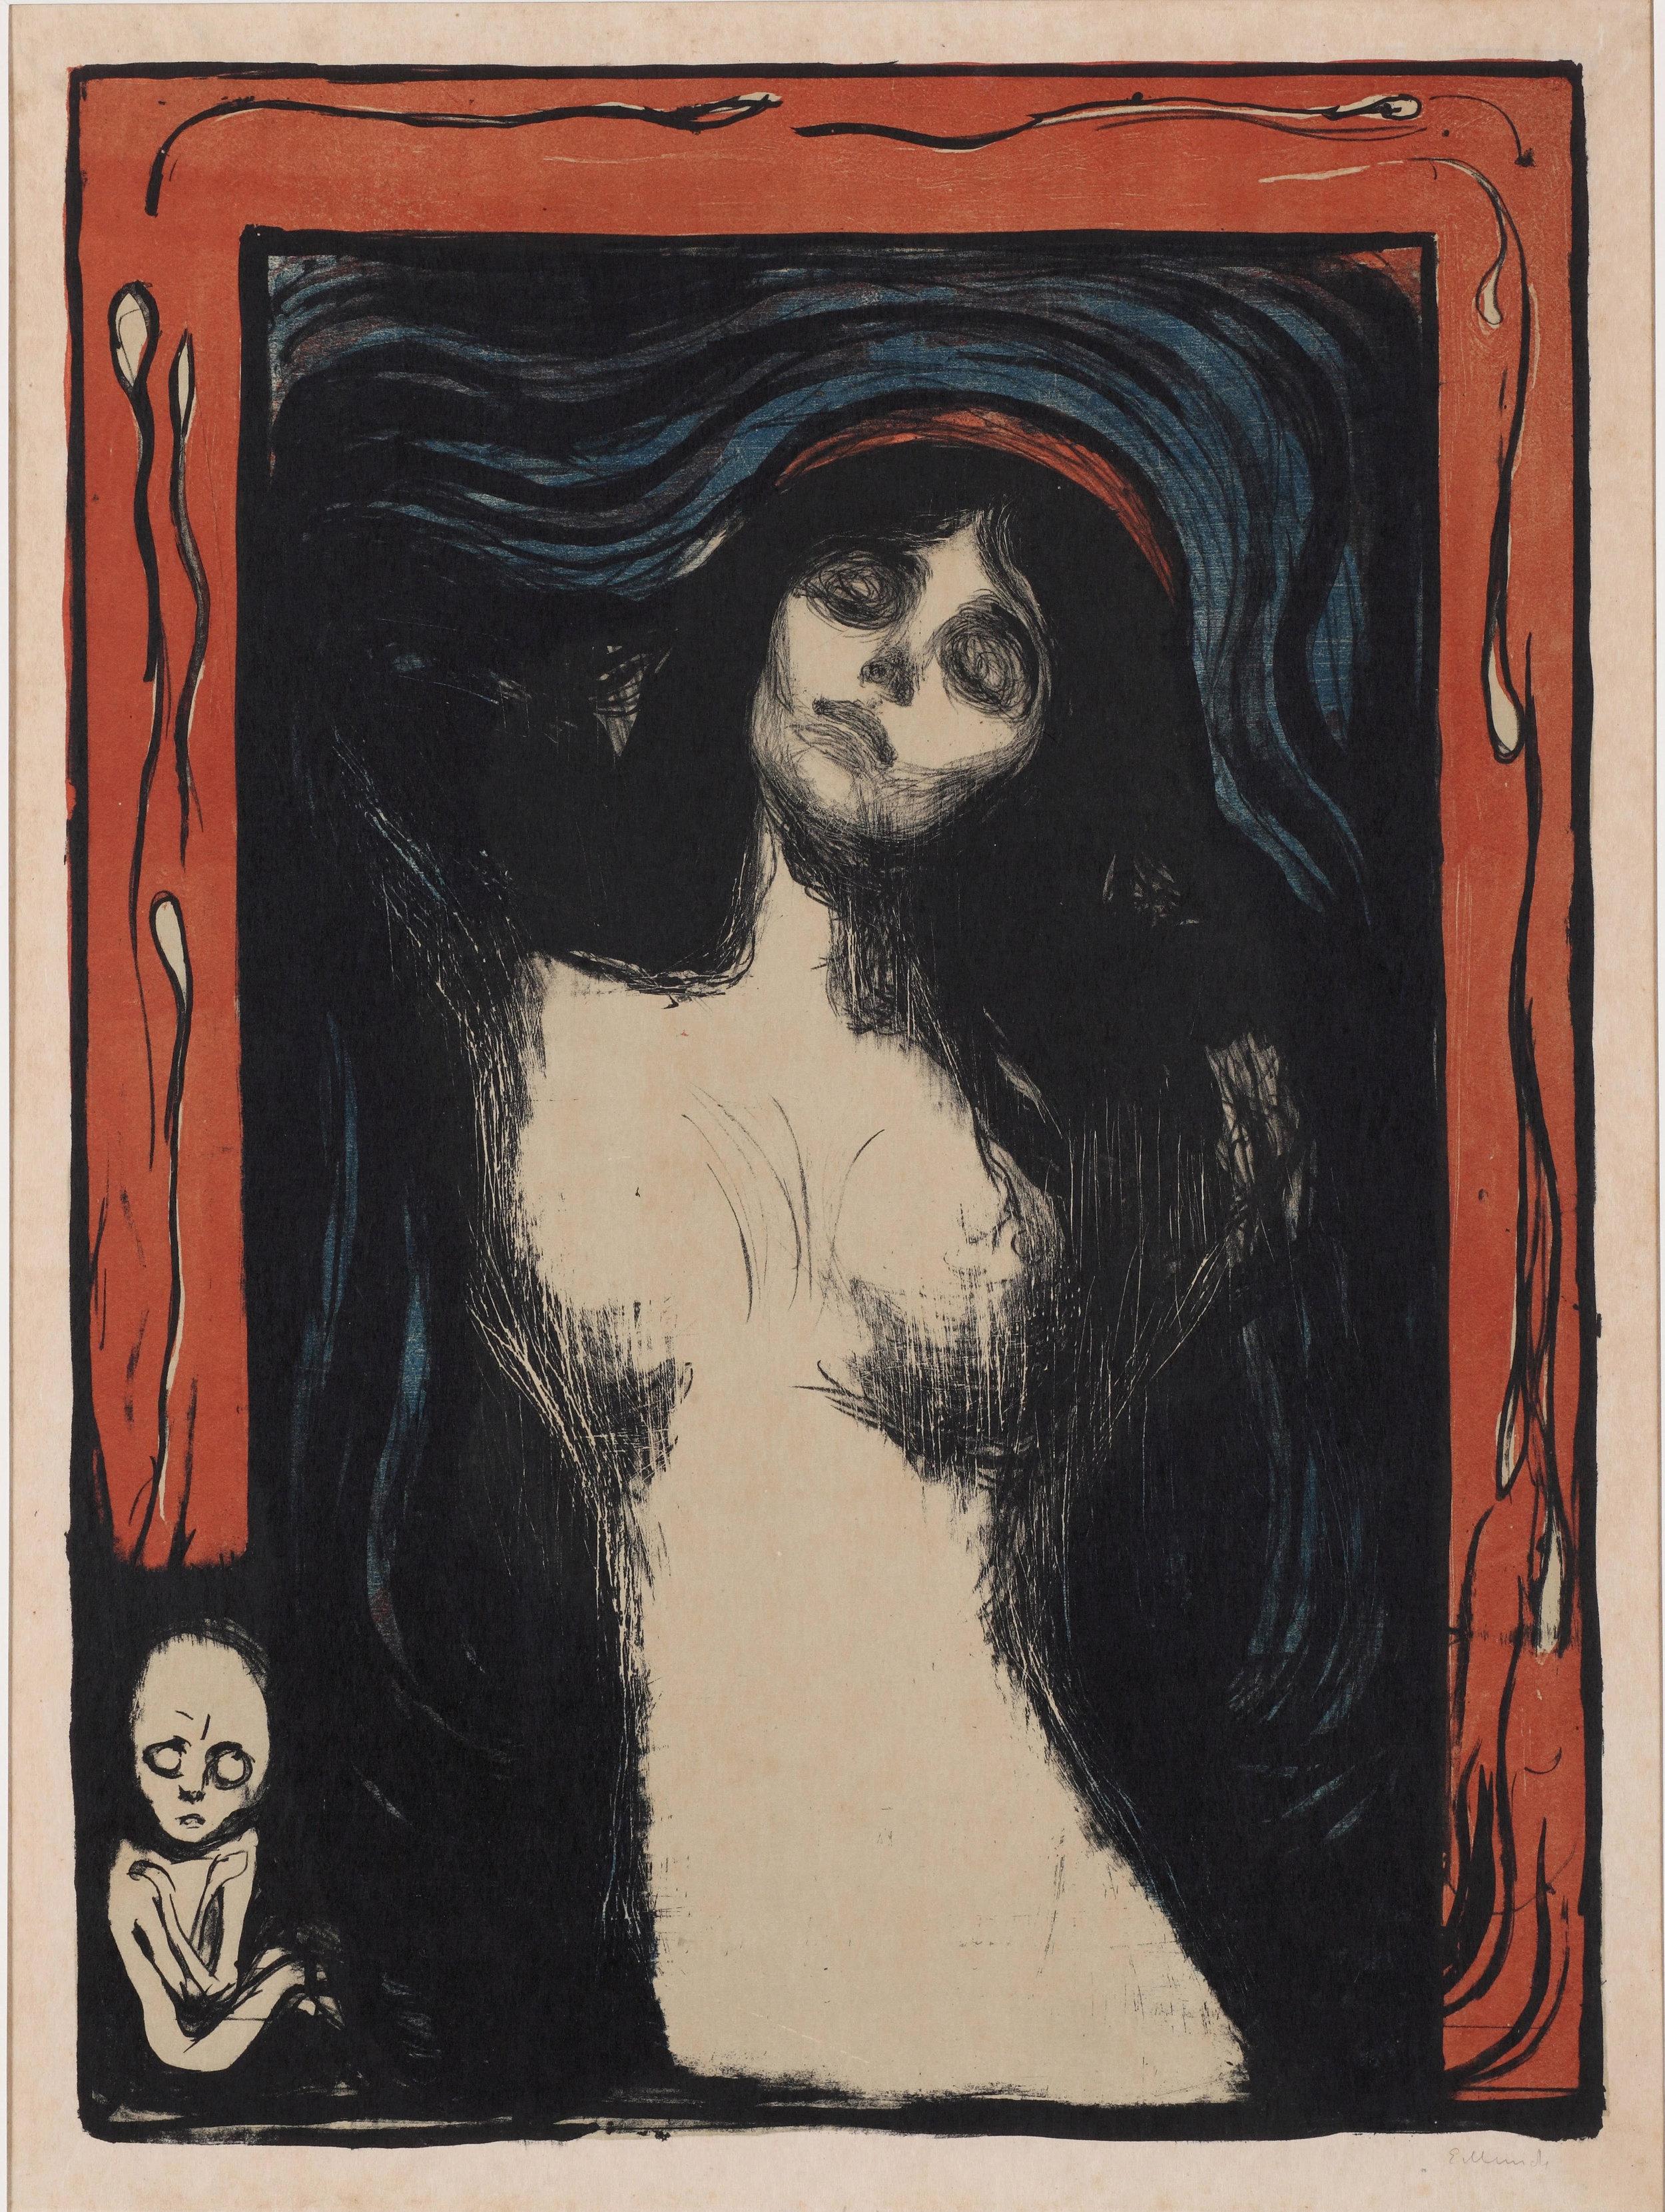 Edvard Munch - Madonna (1895-1902)